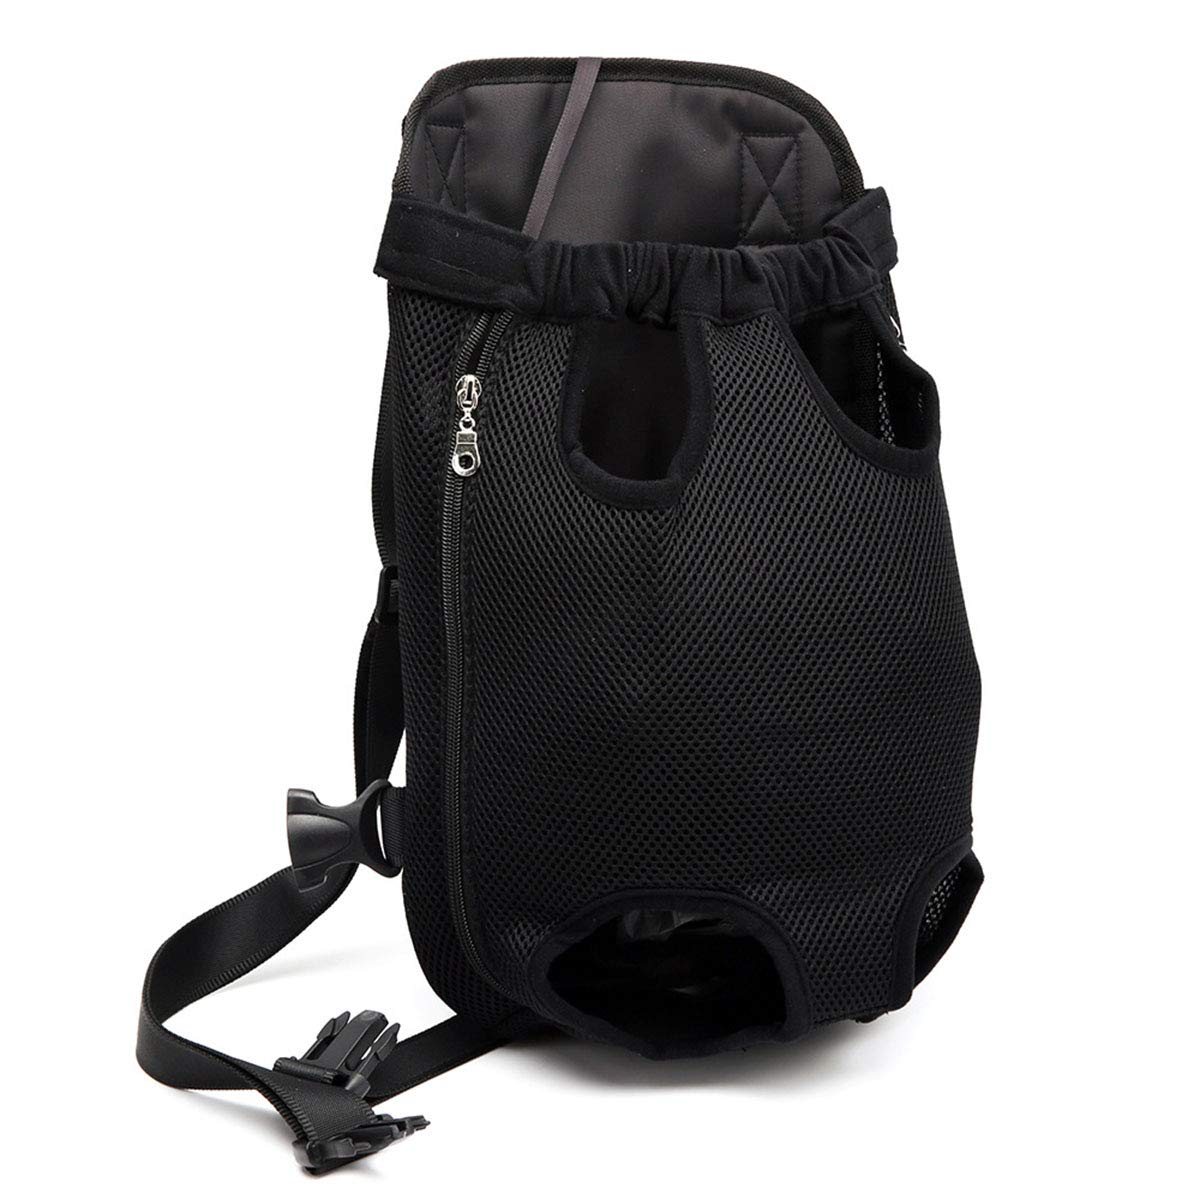 M black M black Pet Carrier,Legs Out Front-Facing Dog Carrier Backpack Hands Free Adjustable Pet Dog Backpack Carrier for Walking Hiking Bike and Motorcycle,M,Black